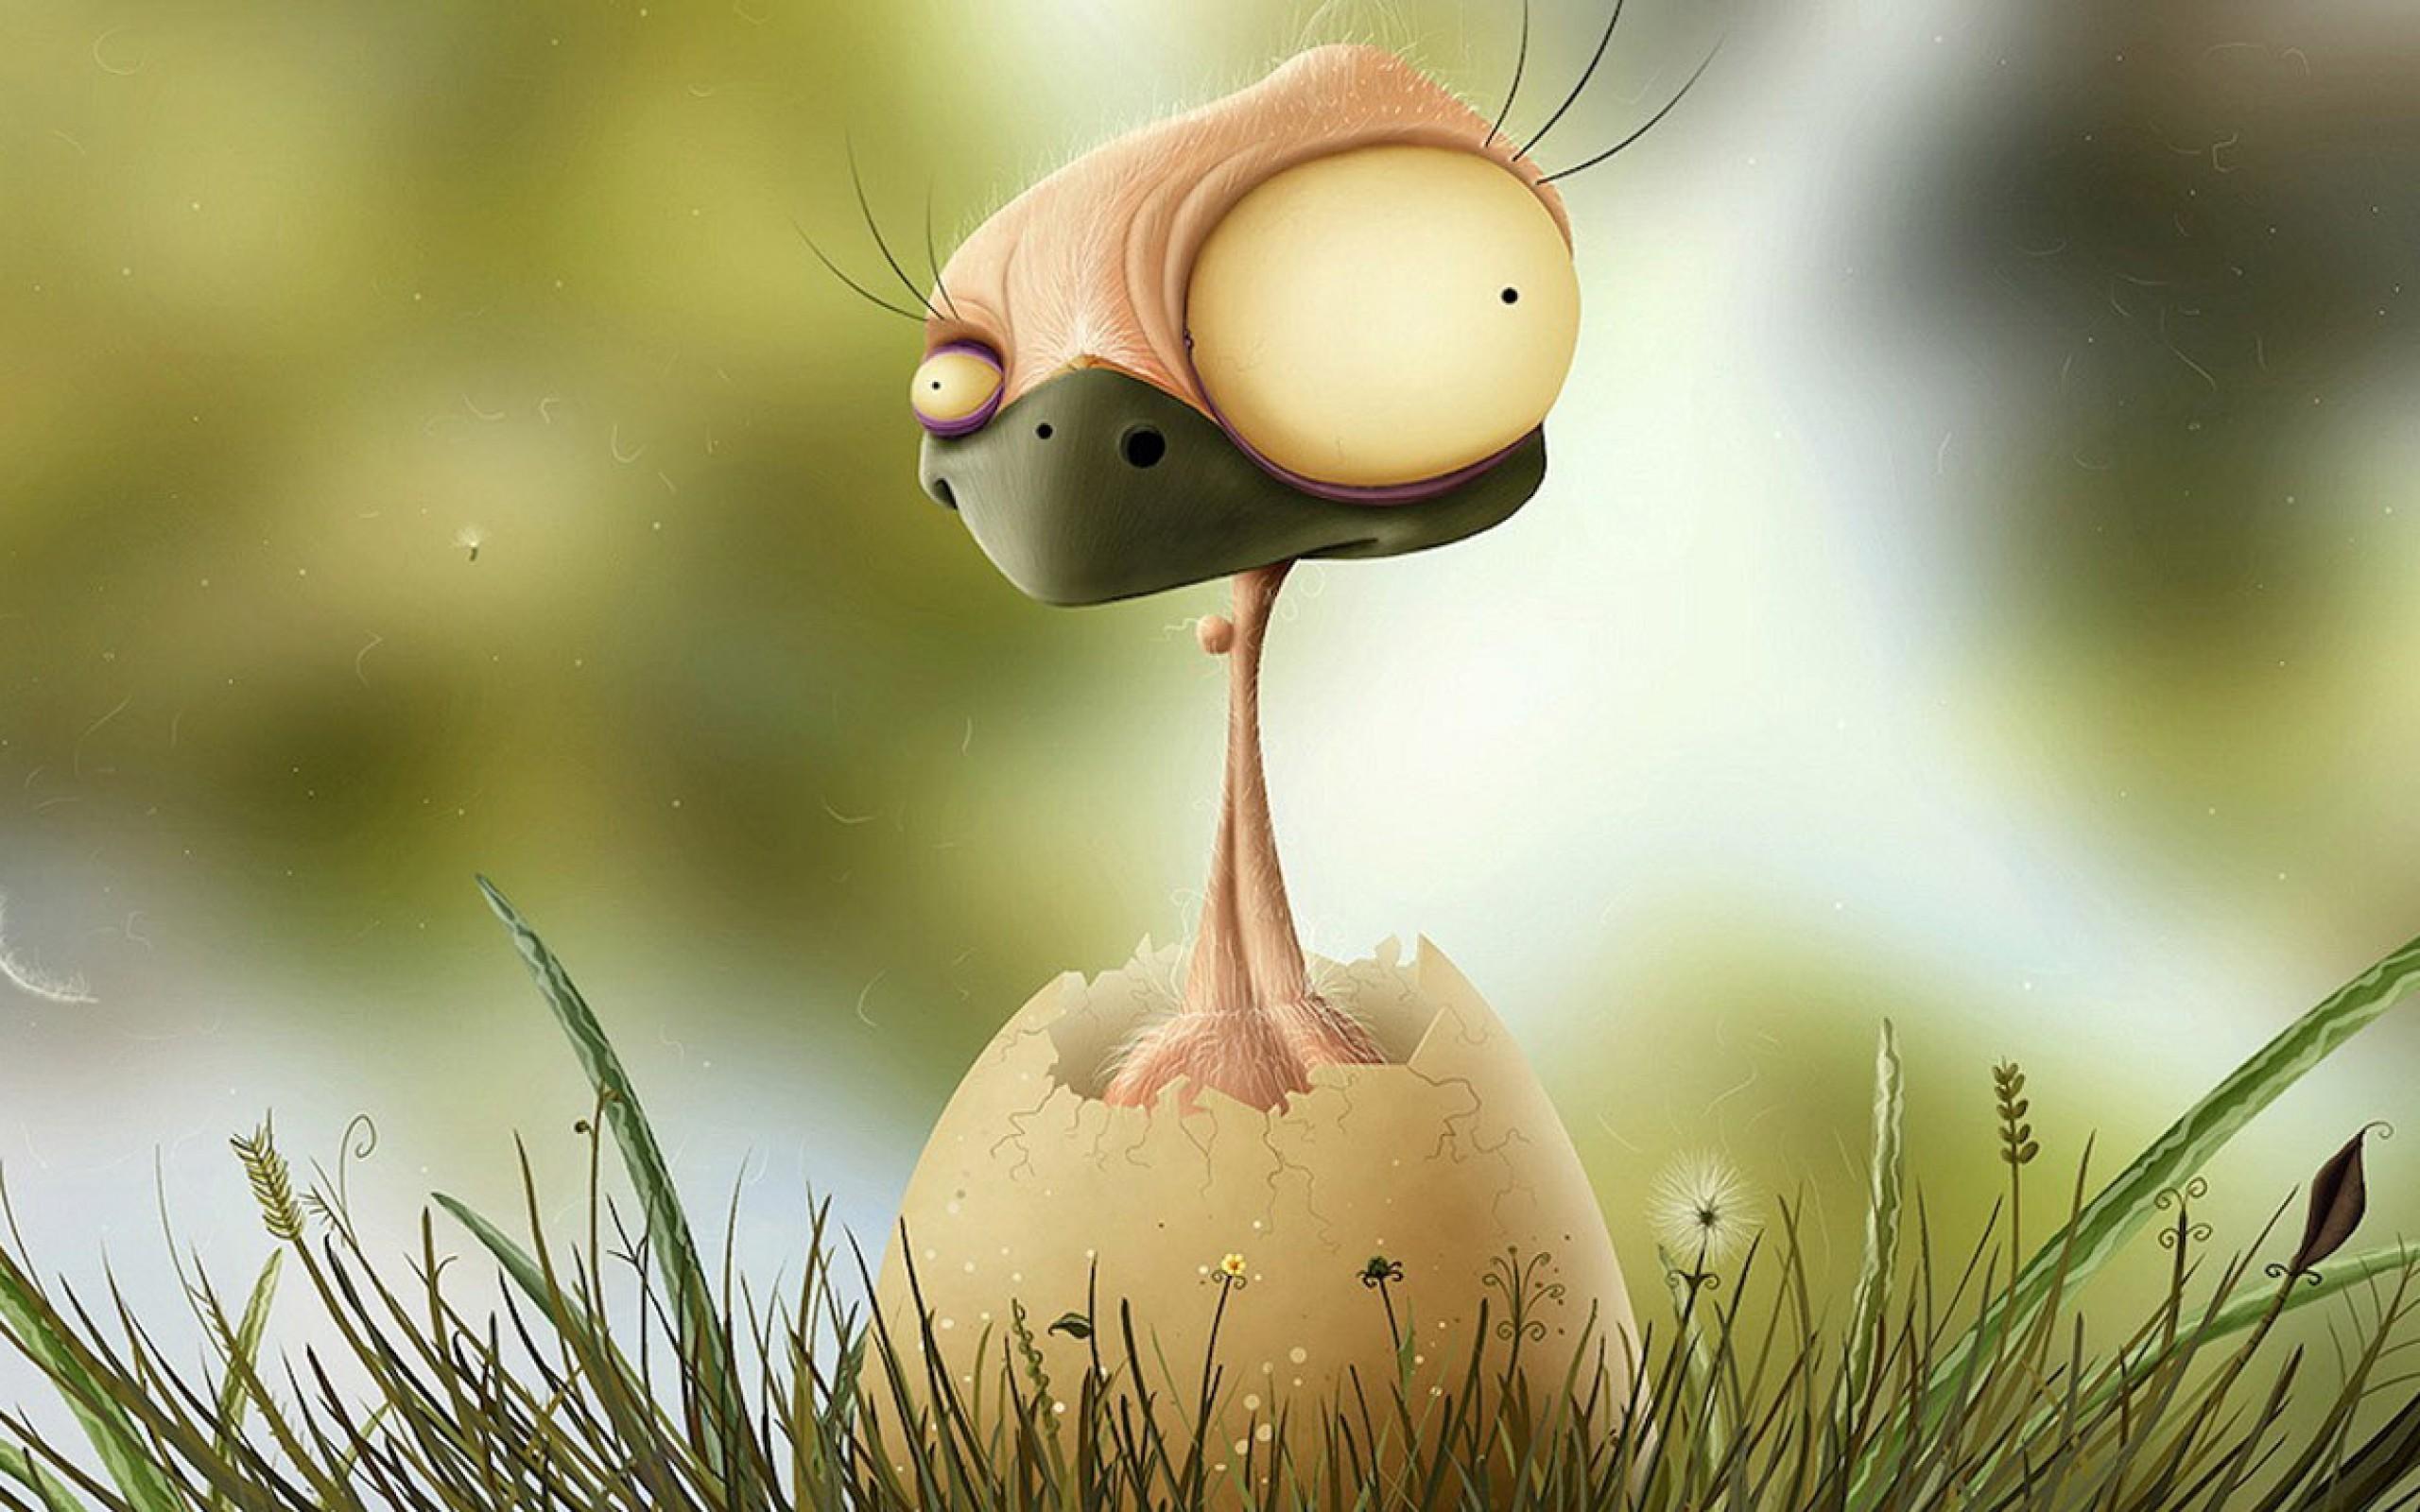 Funny cartoon wallpapers wallpapertag - Baby animation wallpaper ...